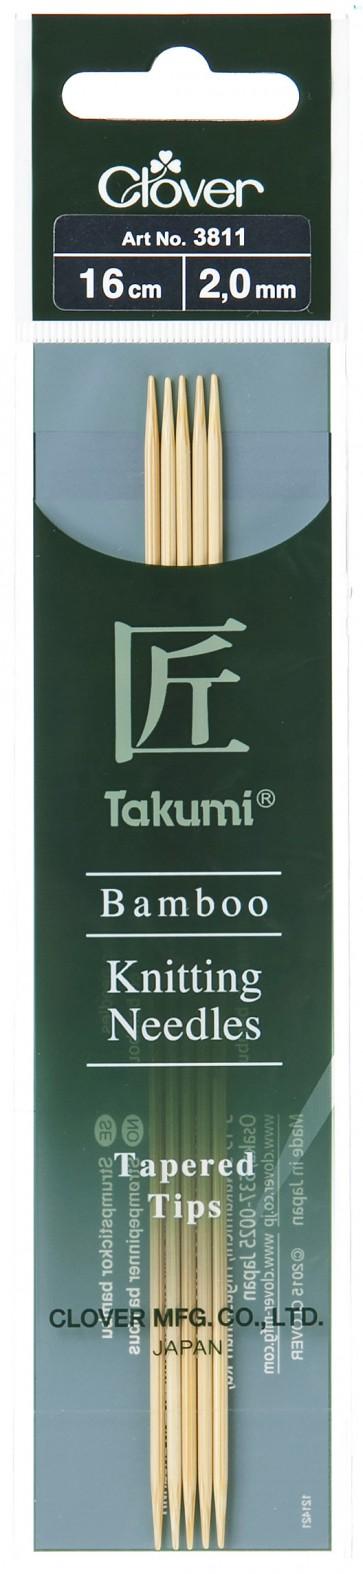 CLOVER Strumpfstrickndl Bambus Takumi 16cm/2.00mm